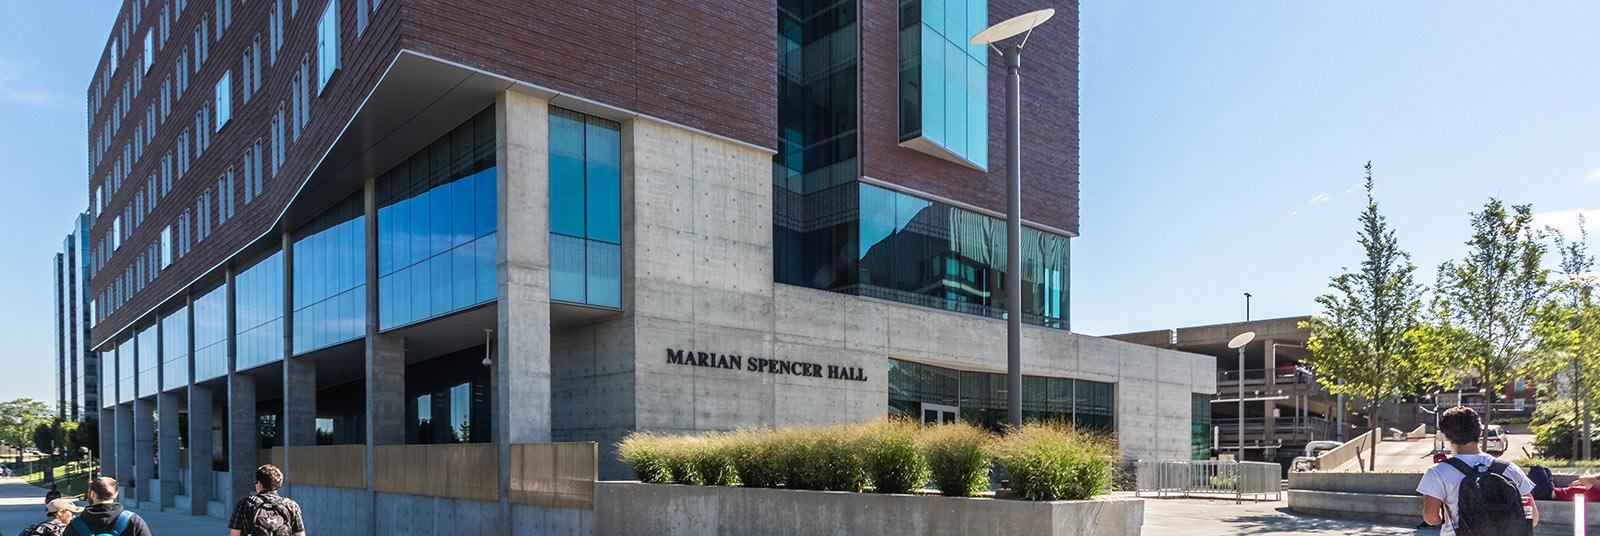 The entrance at University of Cincinnati Marian Spencer Hall in Cincinnati, Ohio.